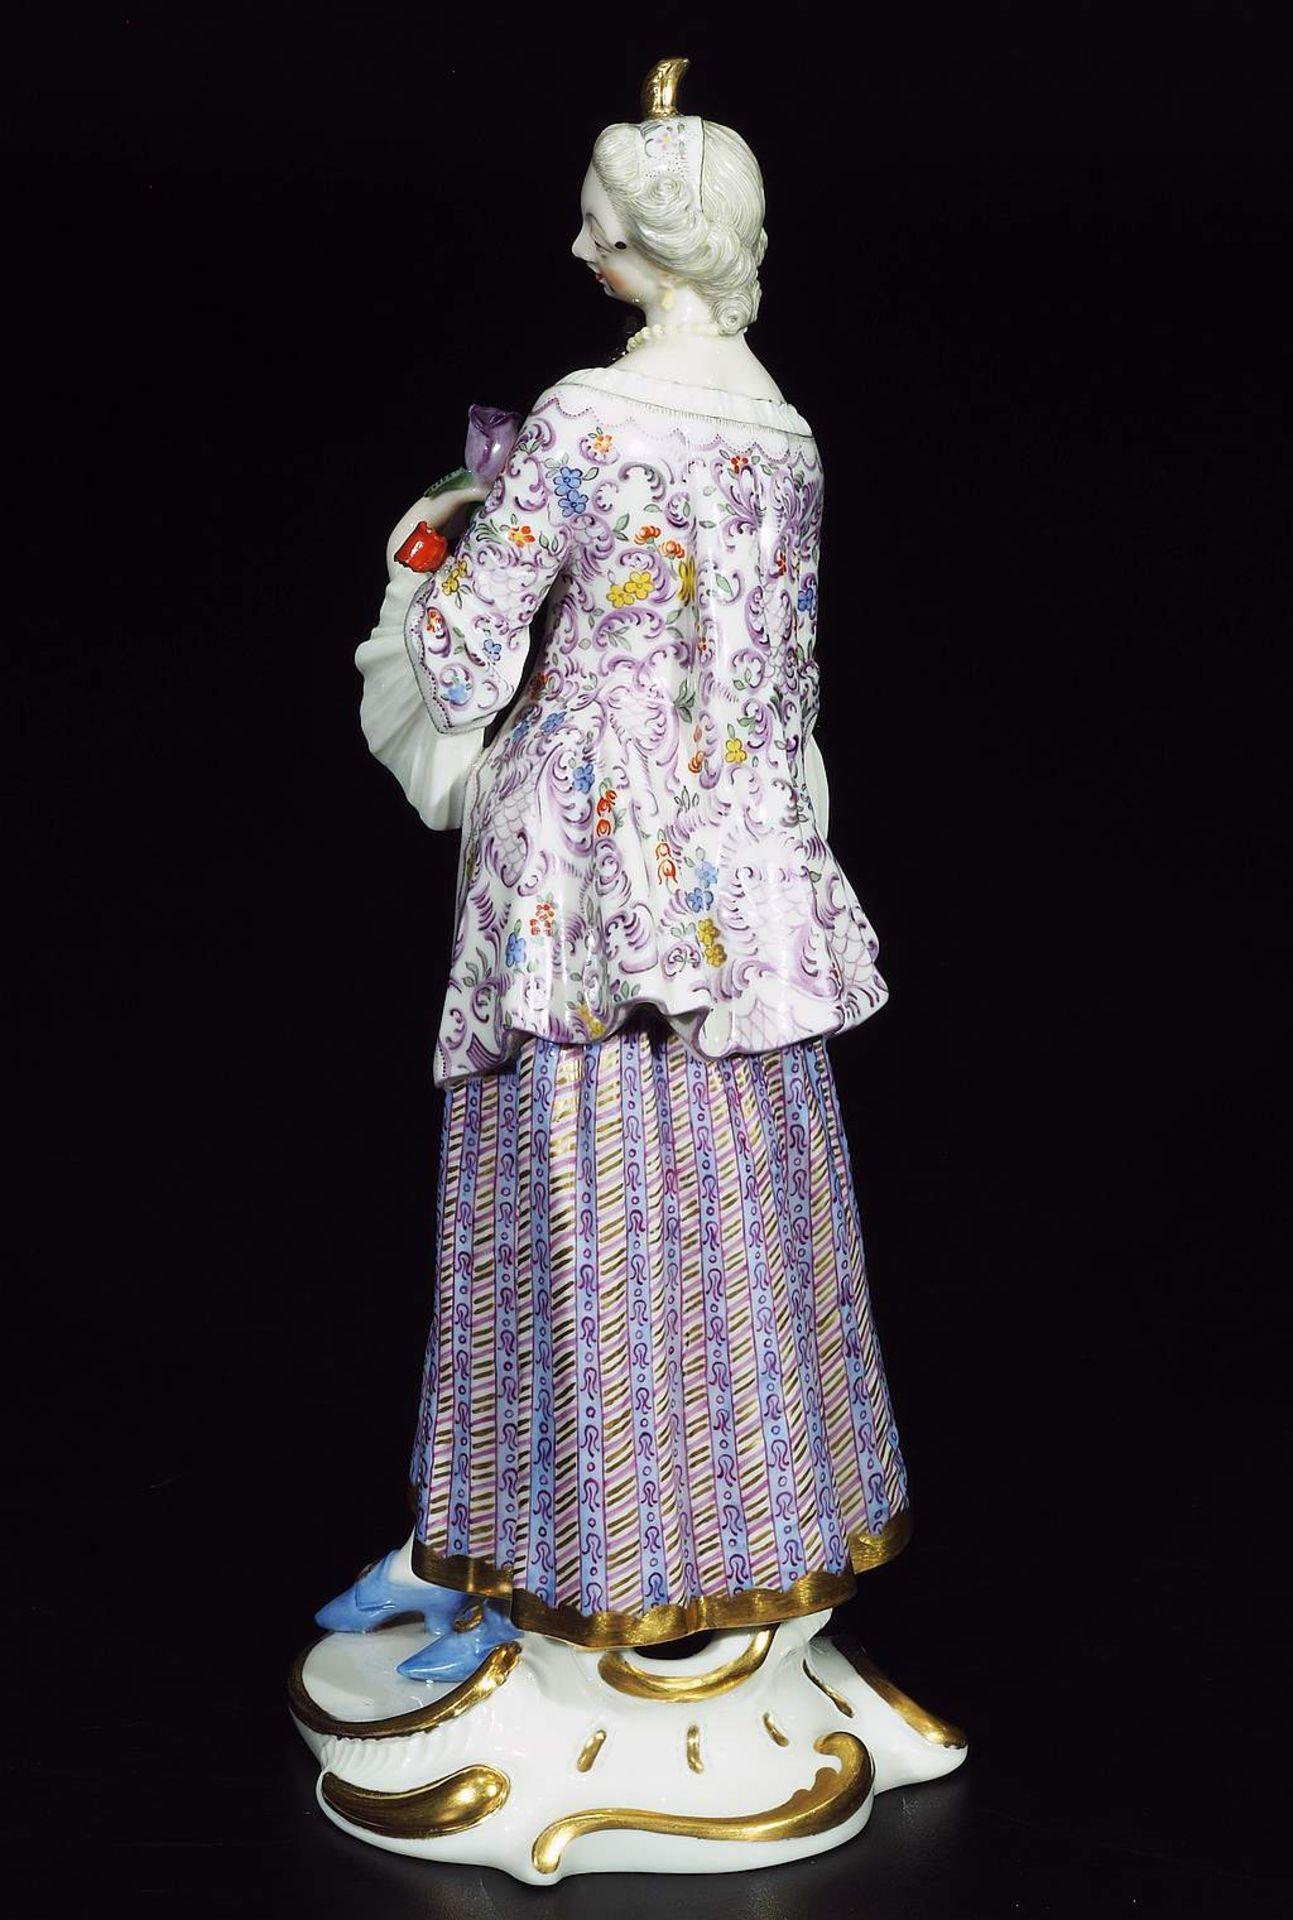 LUCINDA, Figurine der Commedia dell'Arte, NYMPHENBURG, Jahrhundert. - Image 4 of 8